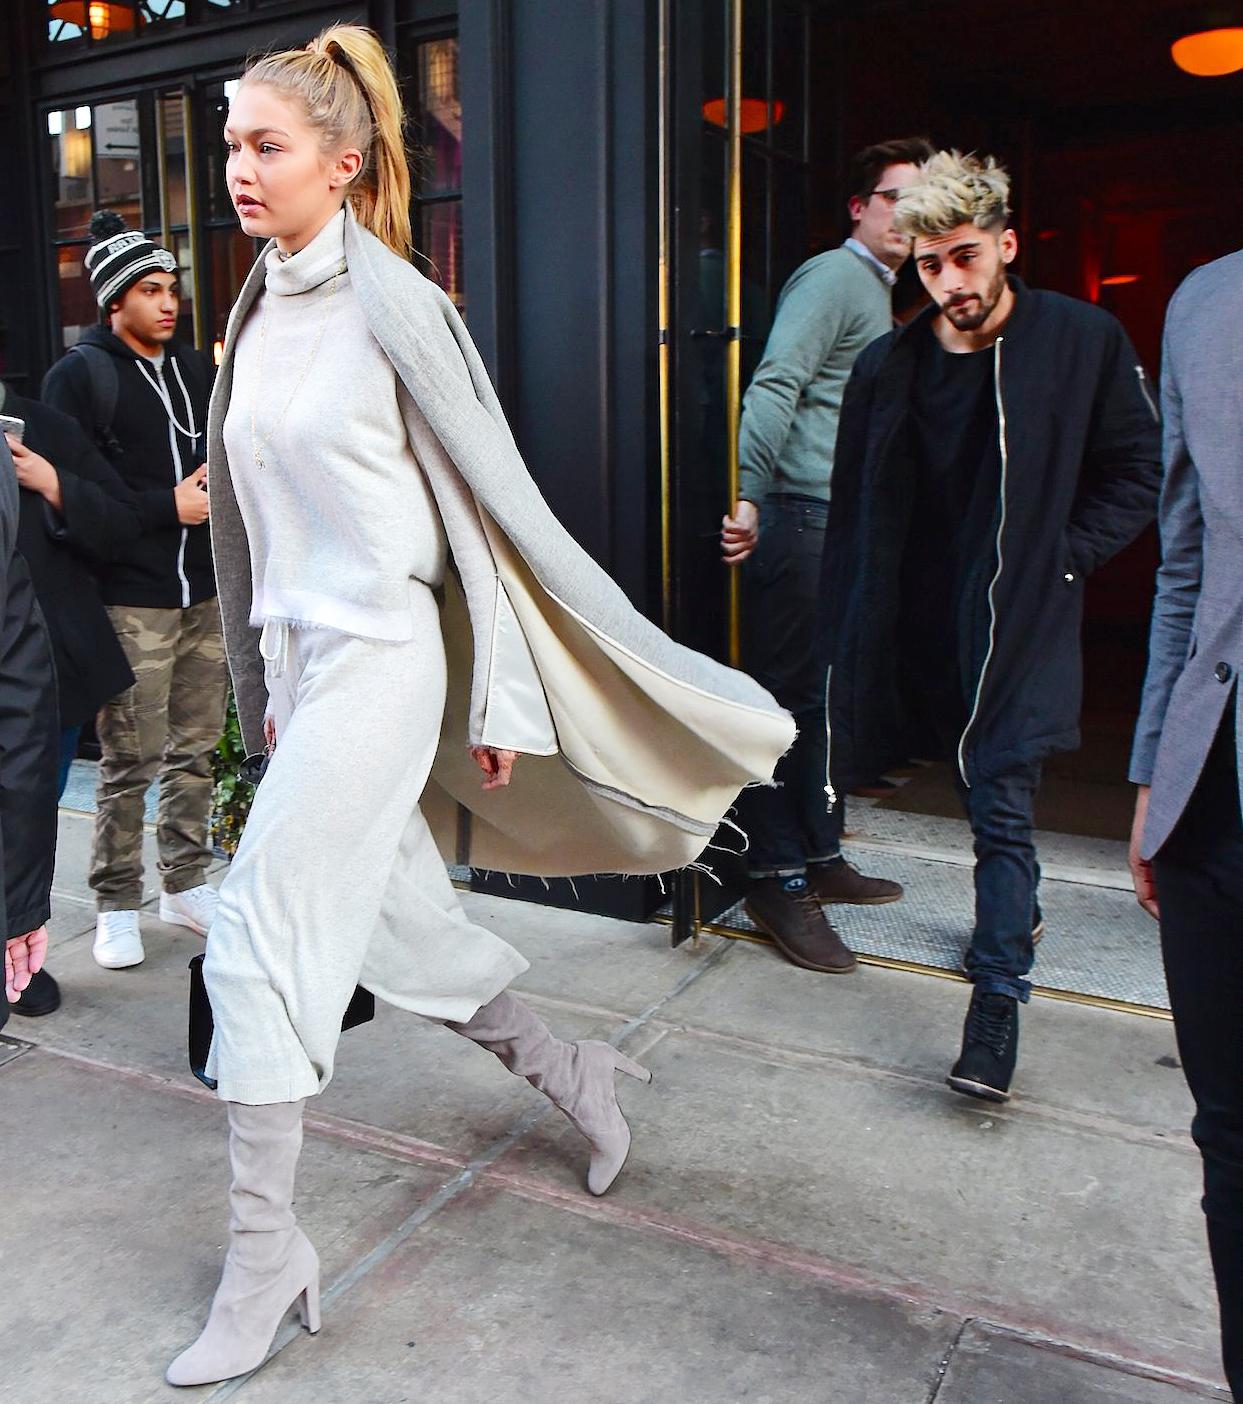 Gigi Hadid, Zayn Malik Go Apartment Hunting in NYC: Photos!